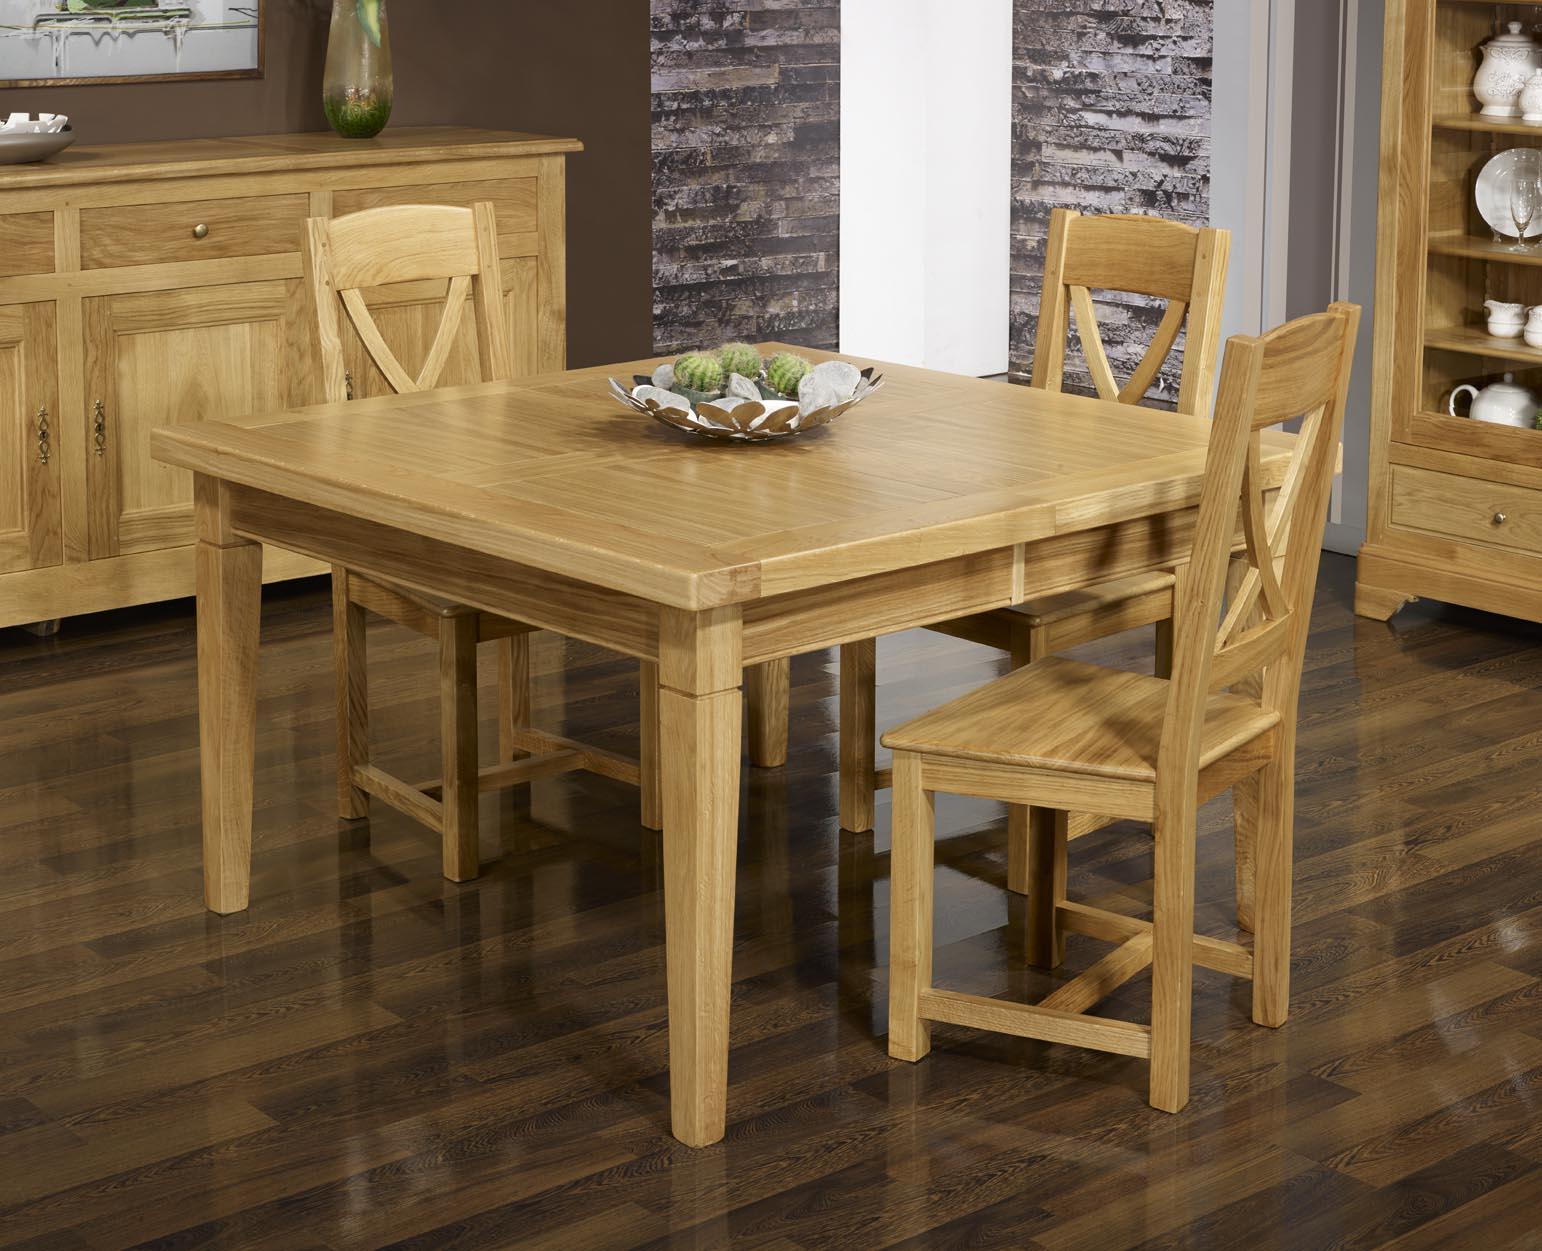 Table de repas carr e en ch ne massif 150x150 meuble en for Table en chene